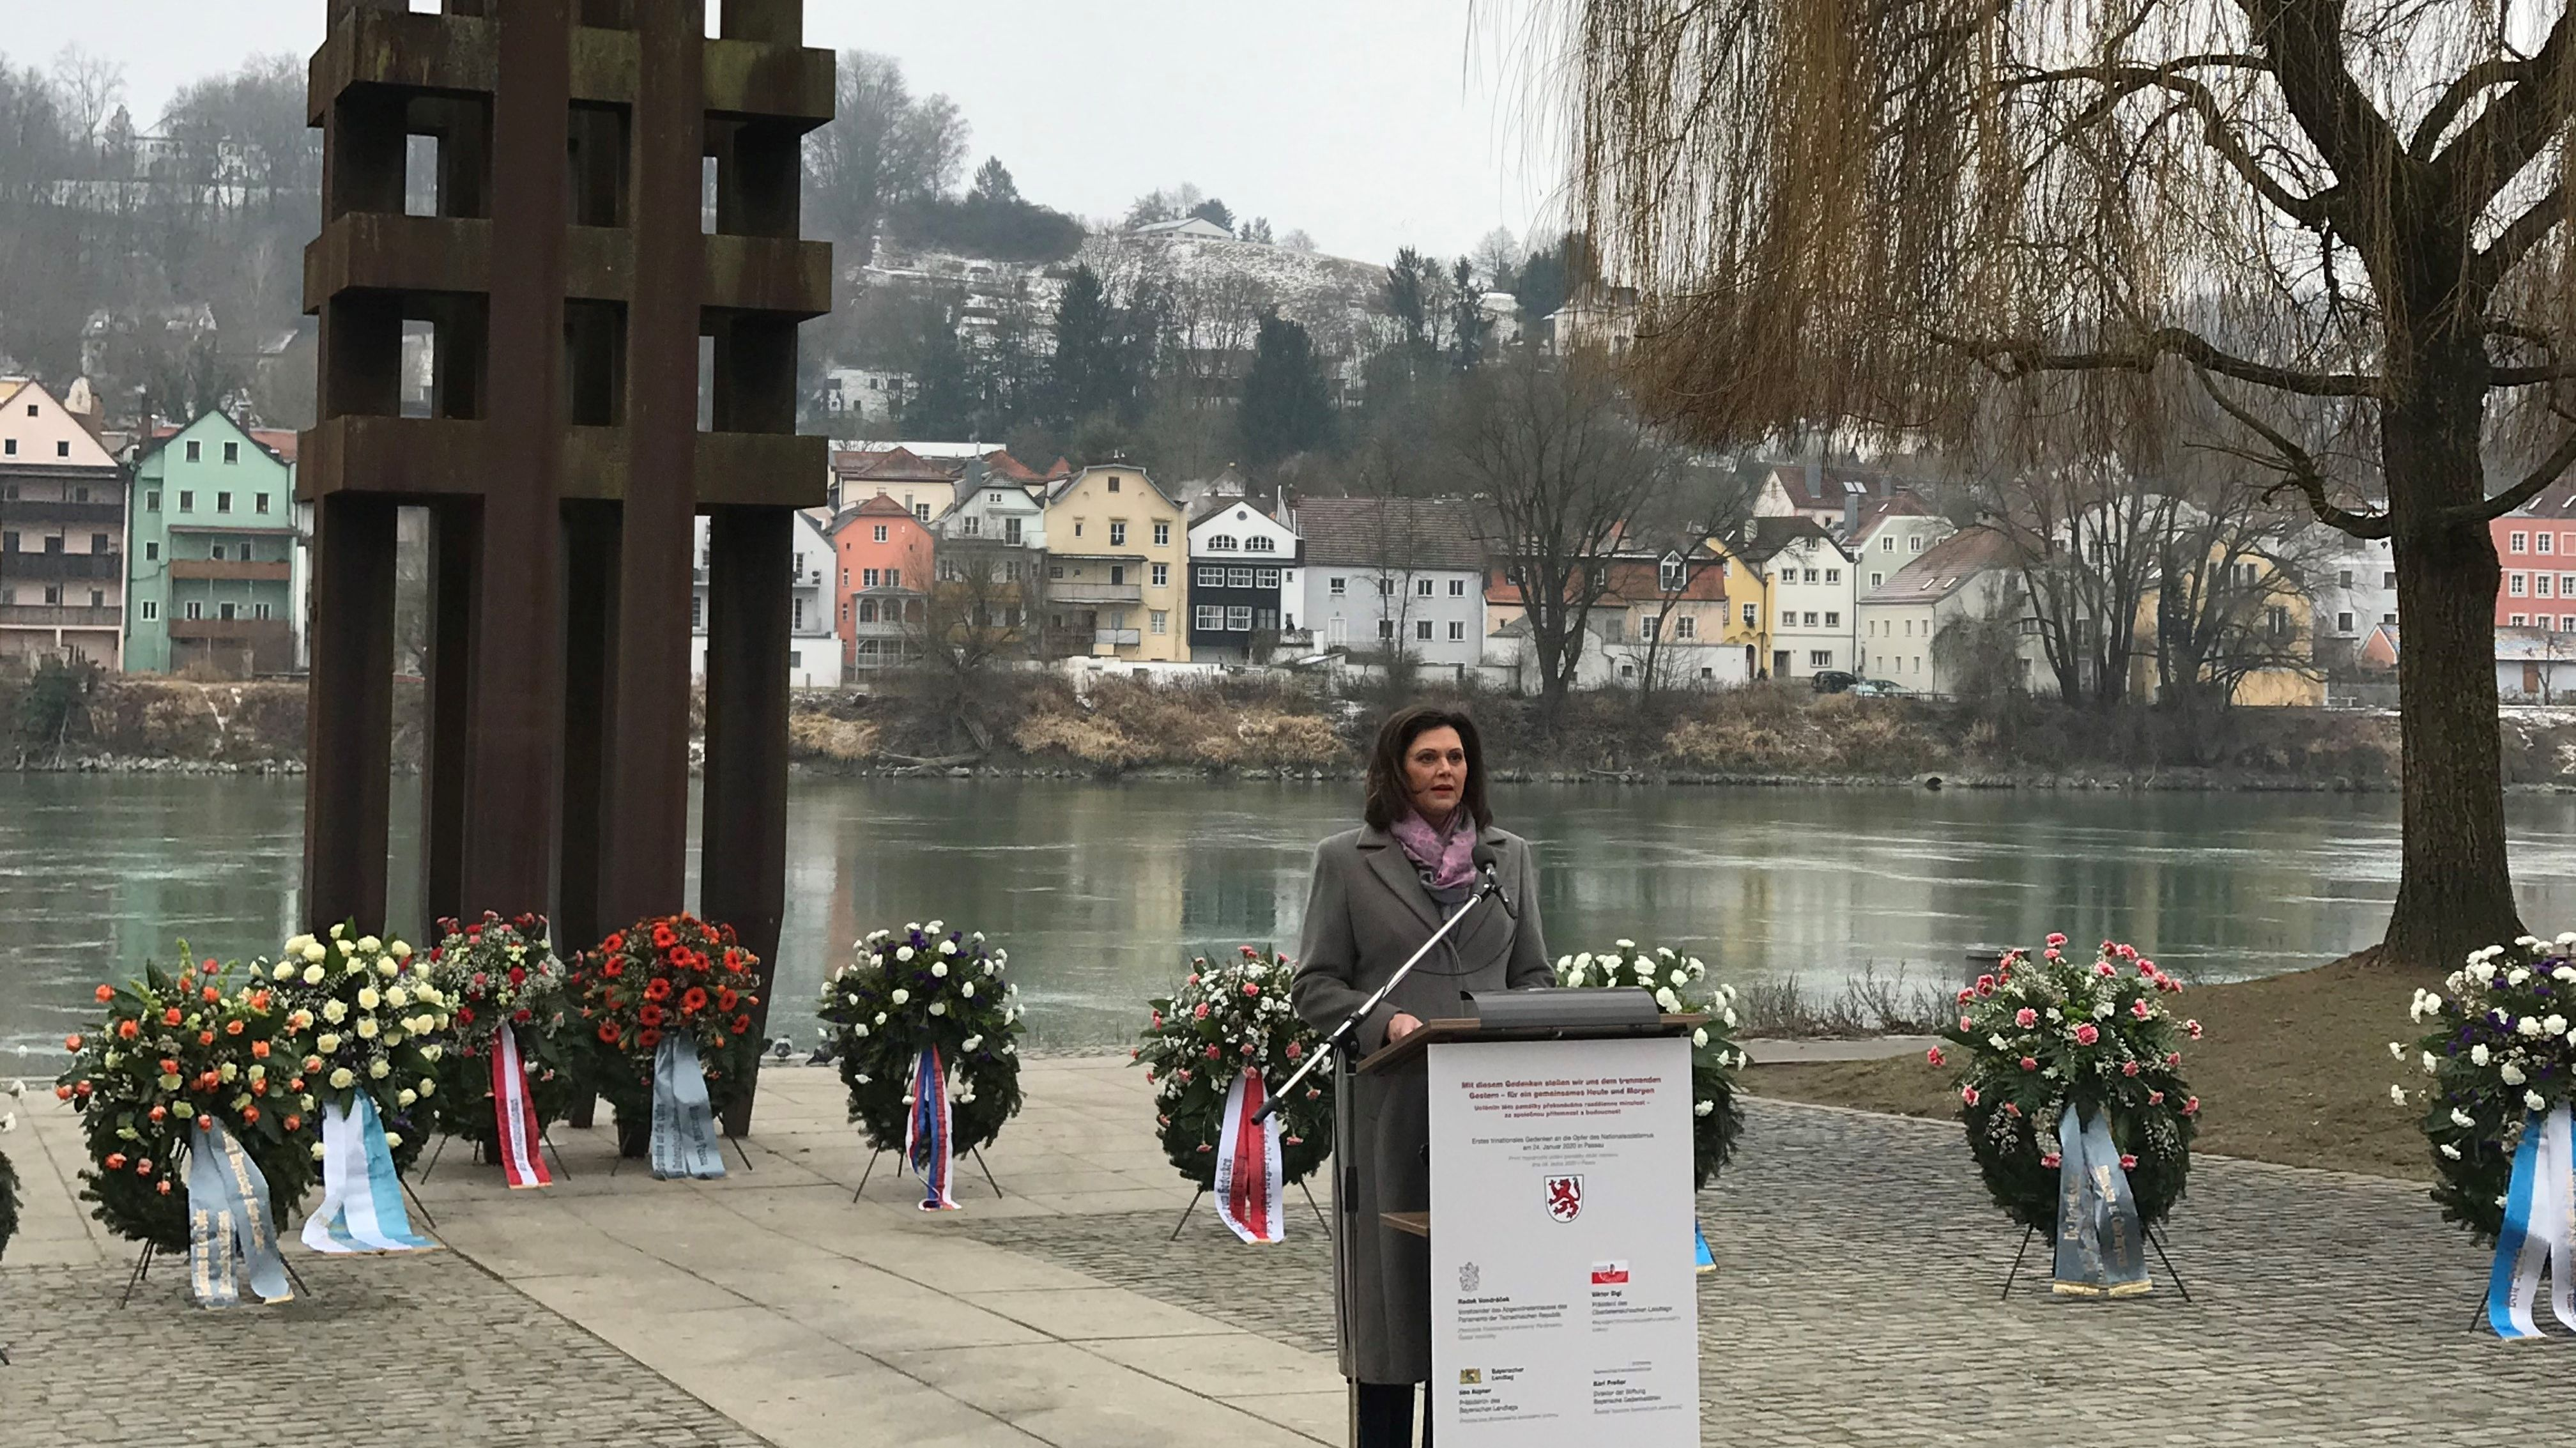 Landtagspräsidentin Ilse Aigner (CSU) vor dem Passauer Holocaust-Mahnmal